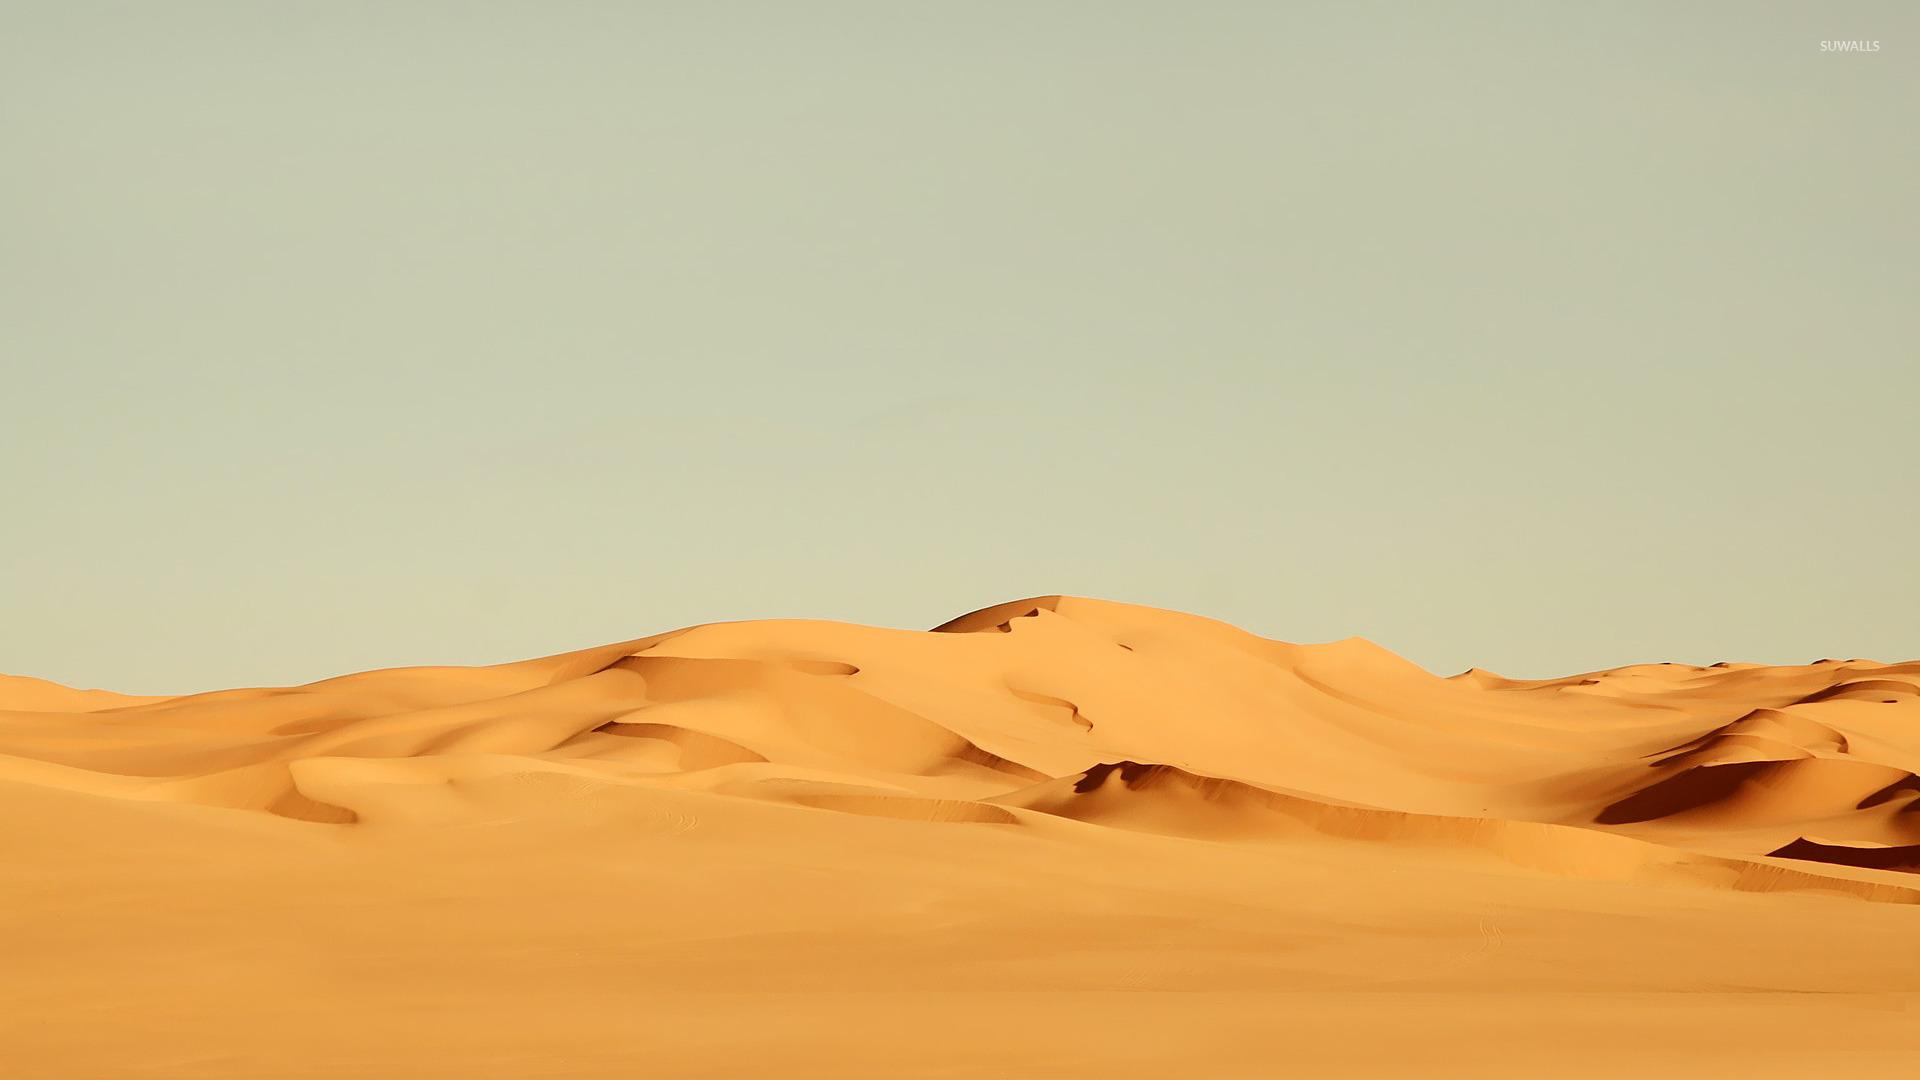 1920x1080 hd wallpaper dune - photo #19